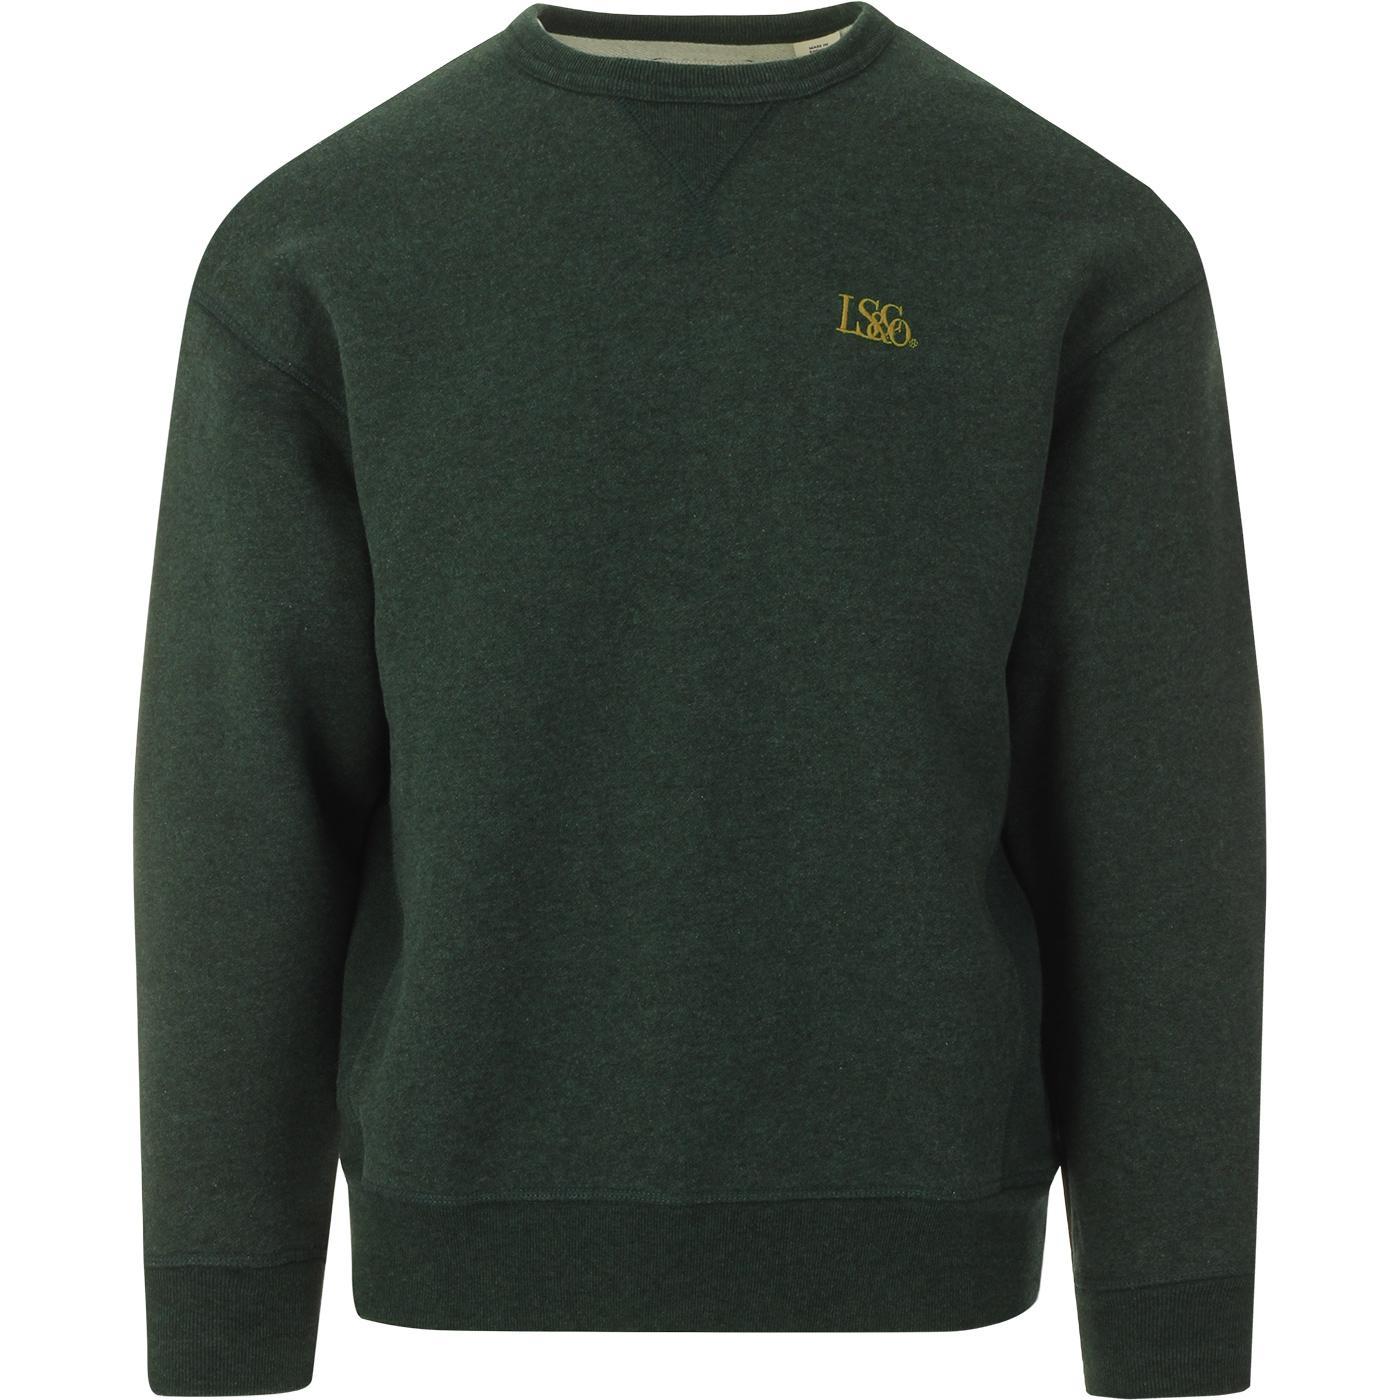 LEVI'S Premium Heavyweight Sweatshirt (Sycamore)